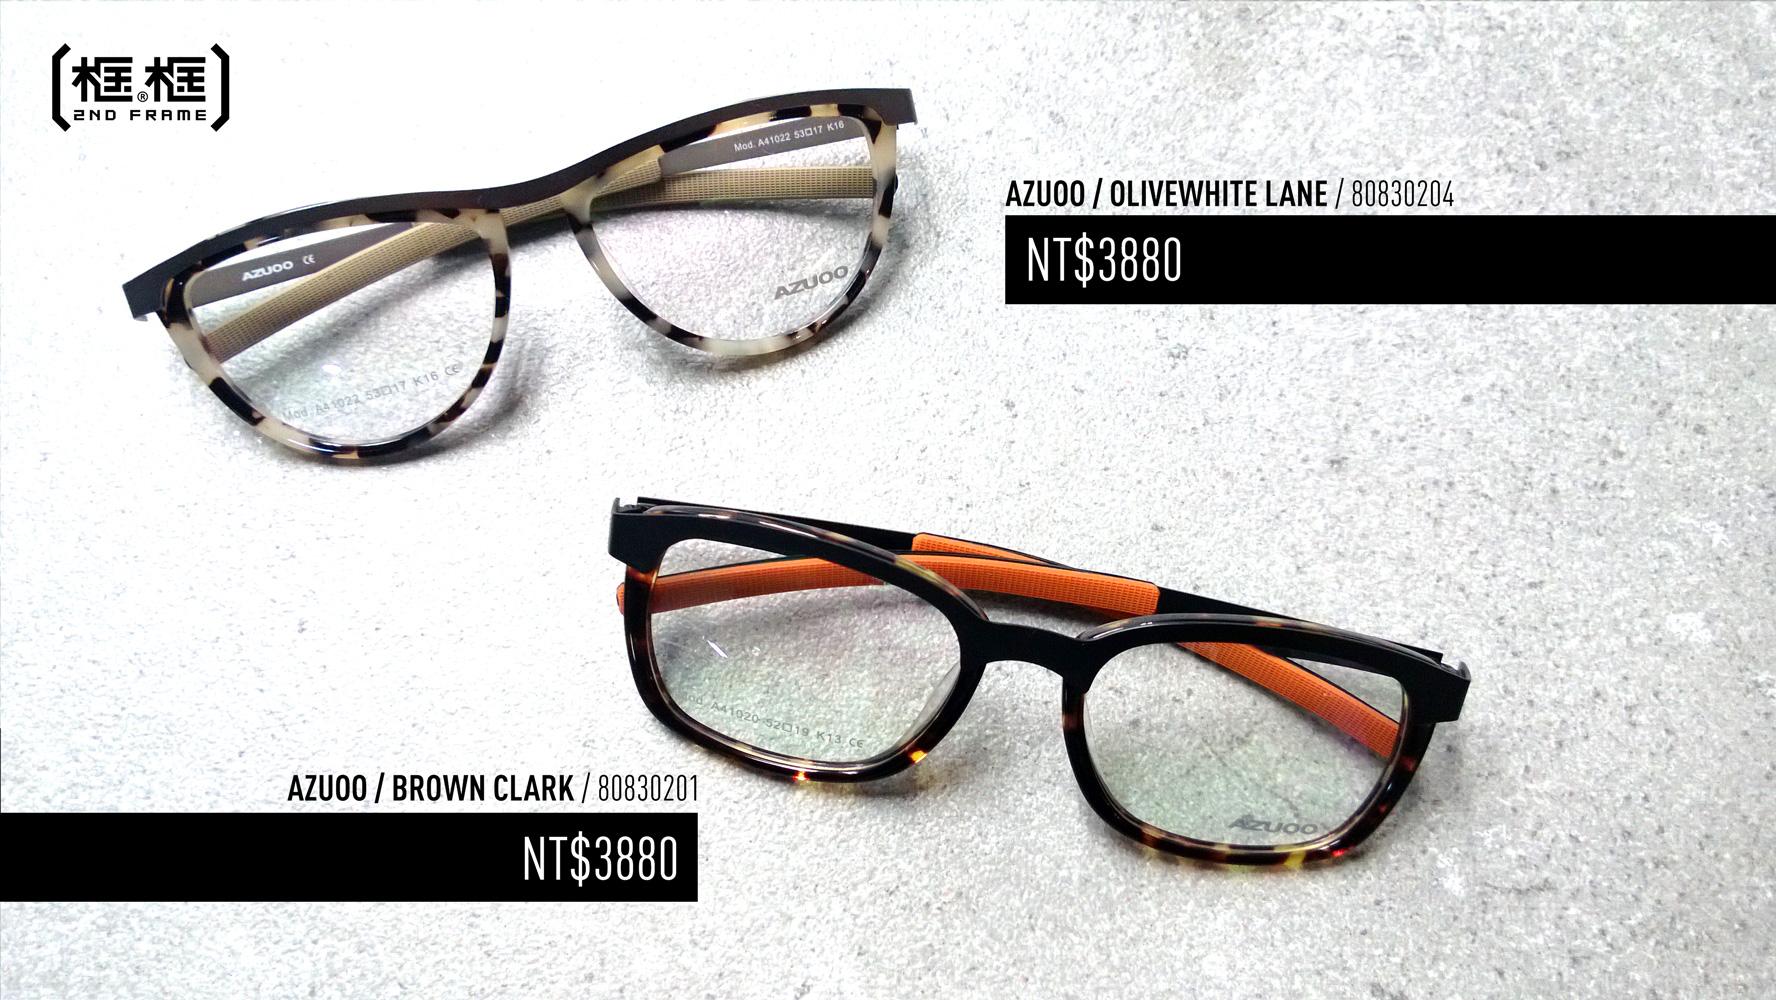 OLIVEWHITE LANE / BROWN CLARK